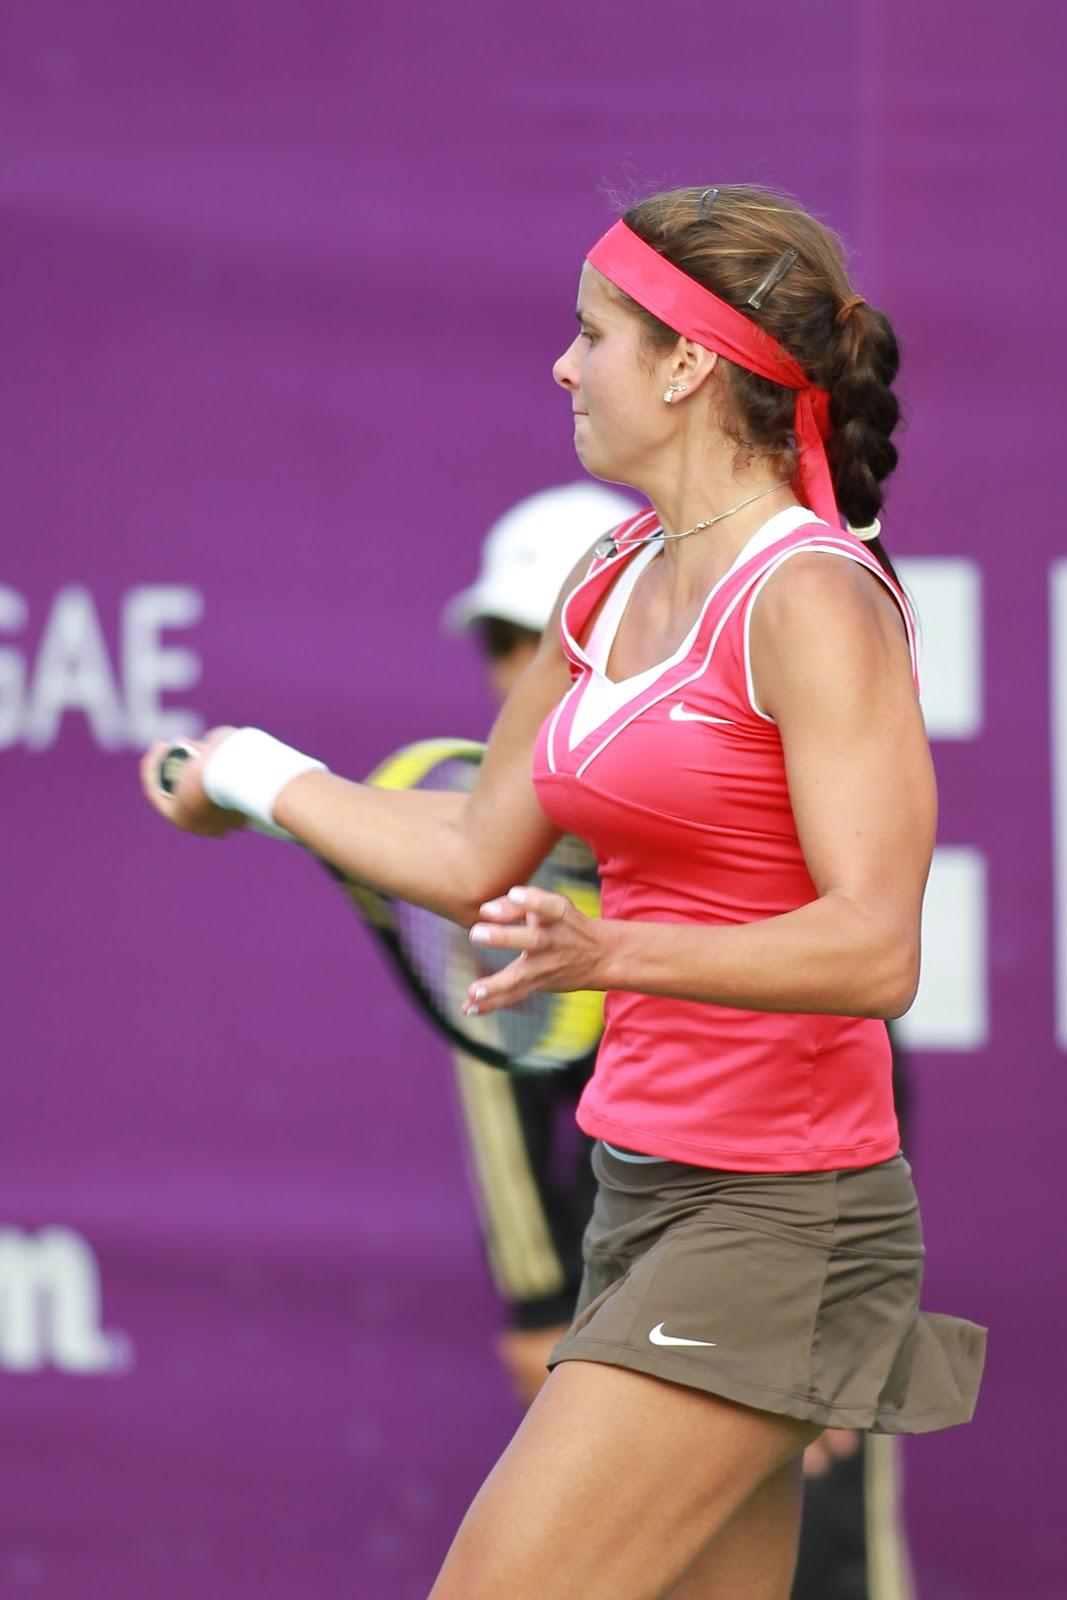 Beauty Of Tennis Julia Goerges